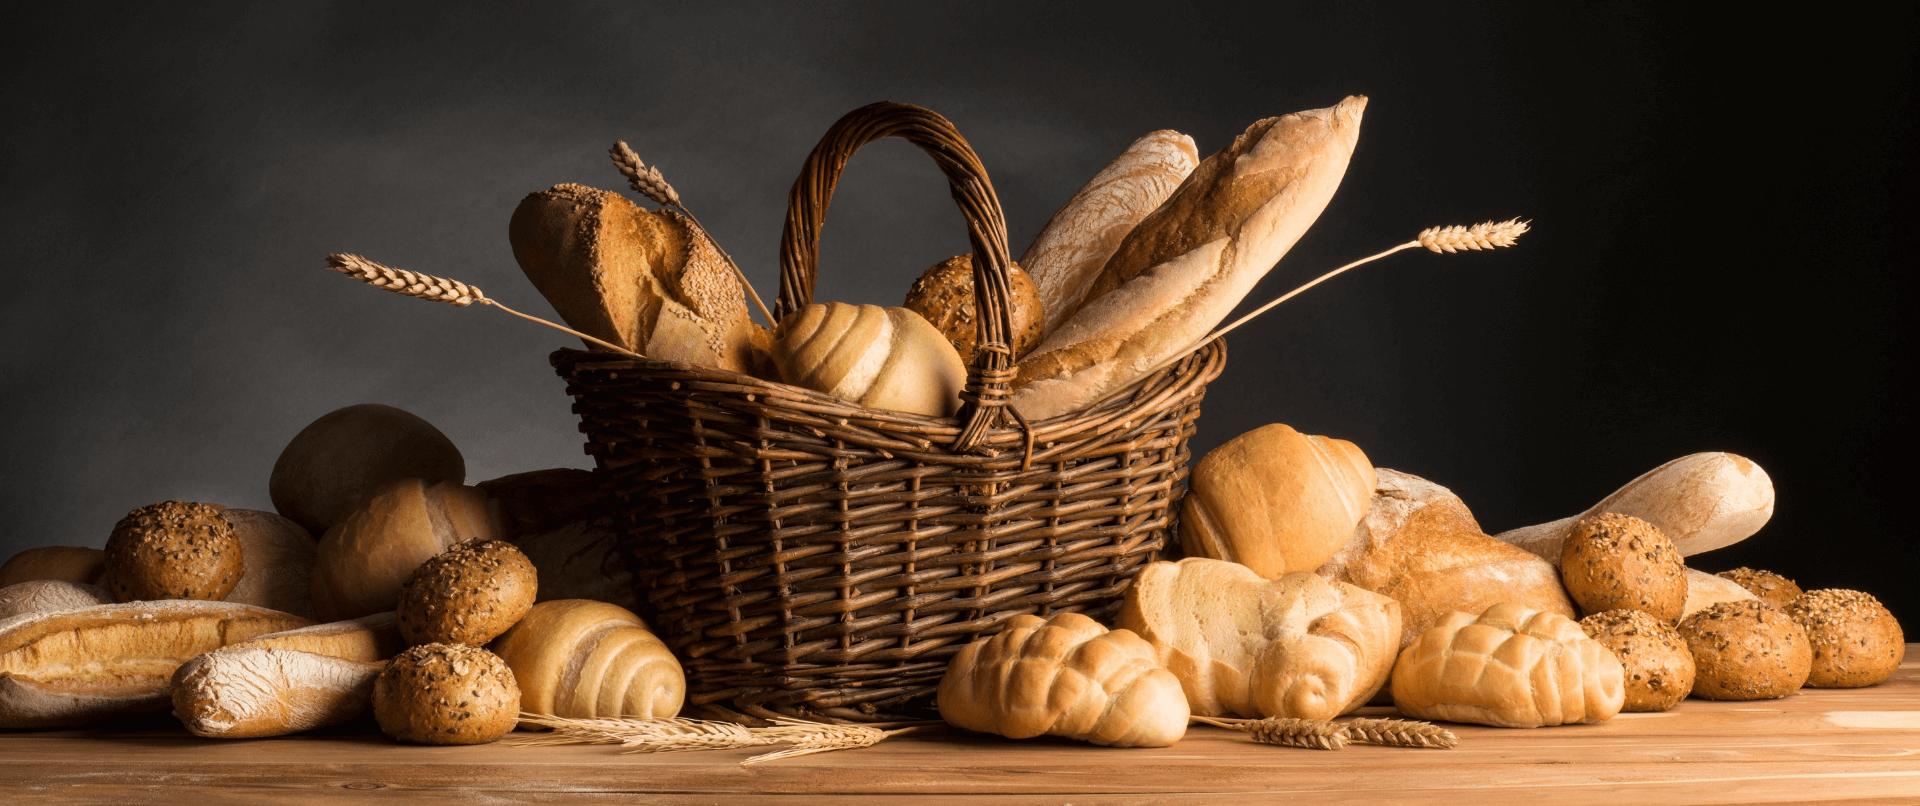 Das passiert, wenn du regelmäßig Brot isst